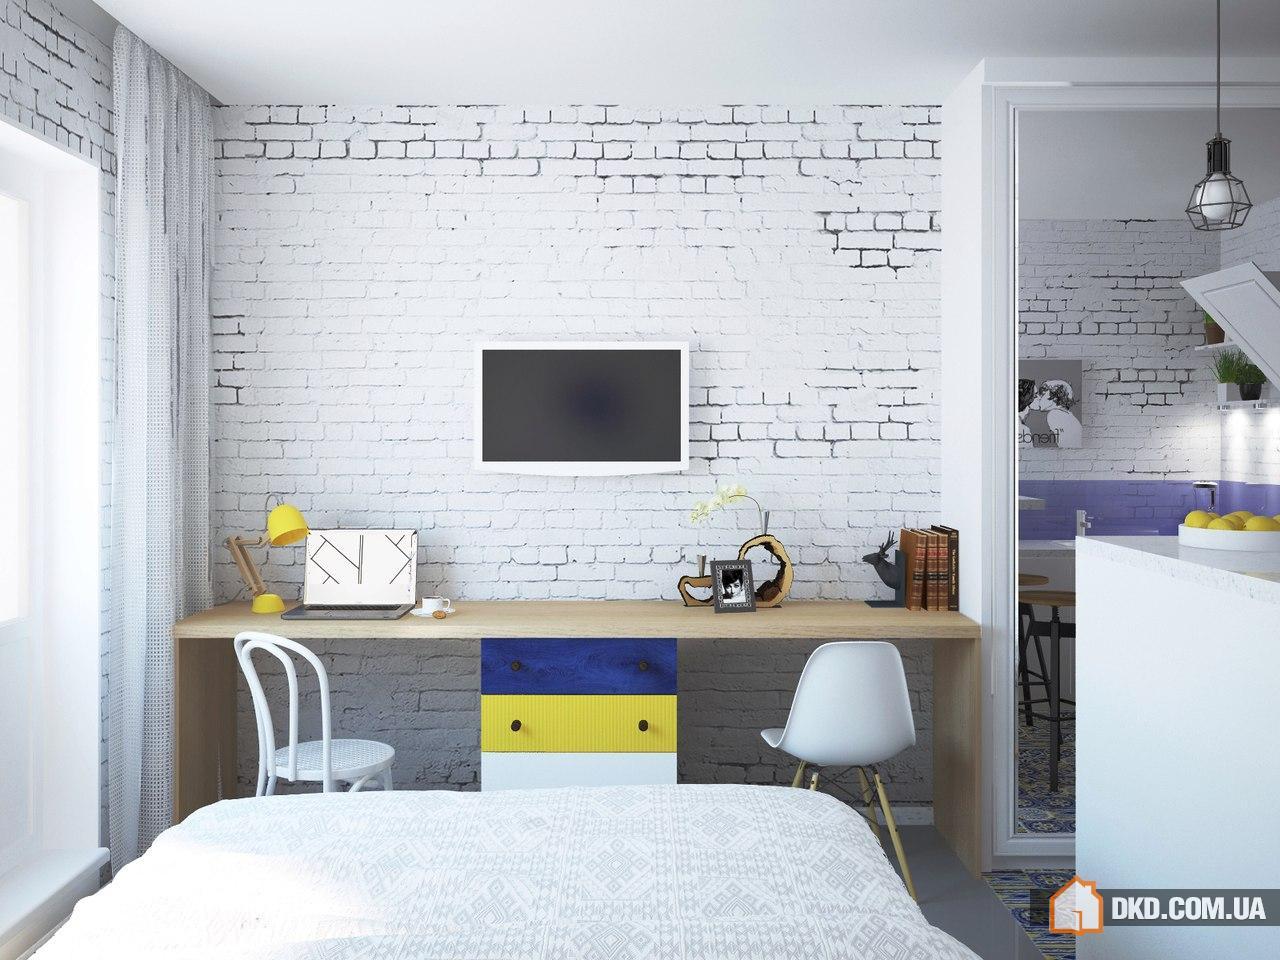 Квартира-студия 28 кв.м дизайн